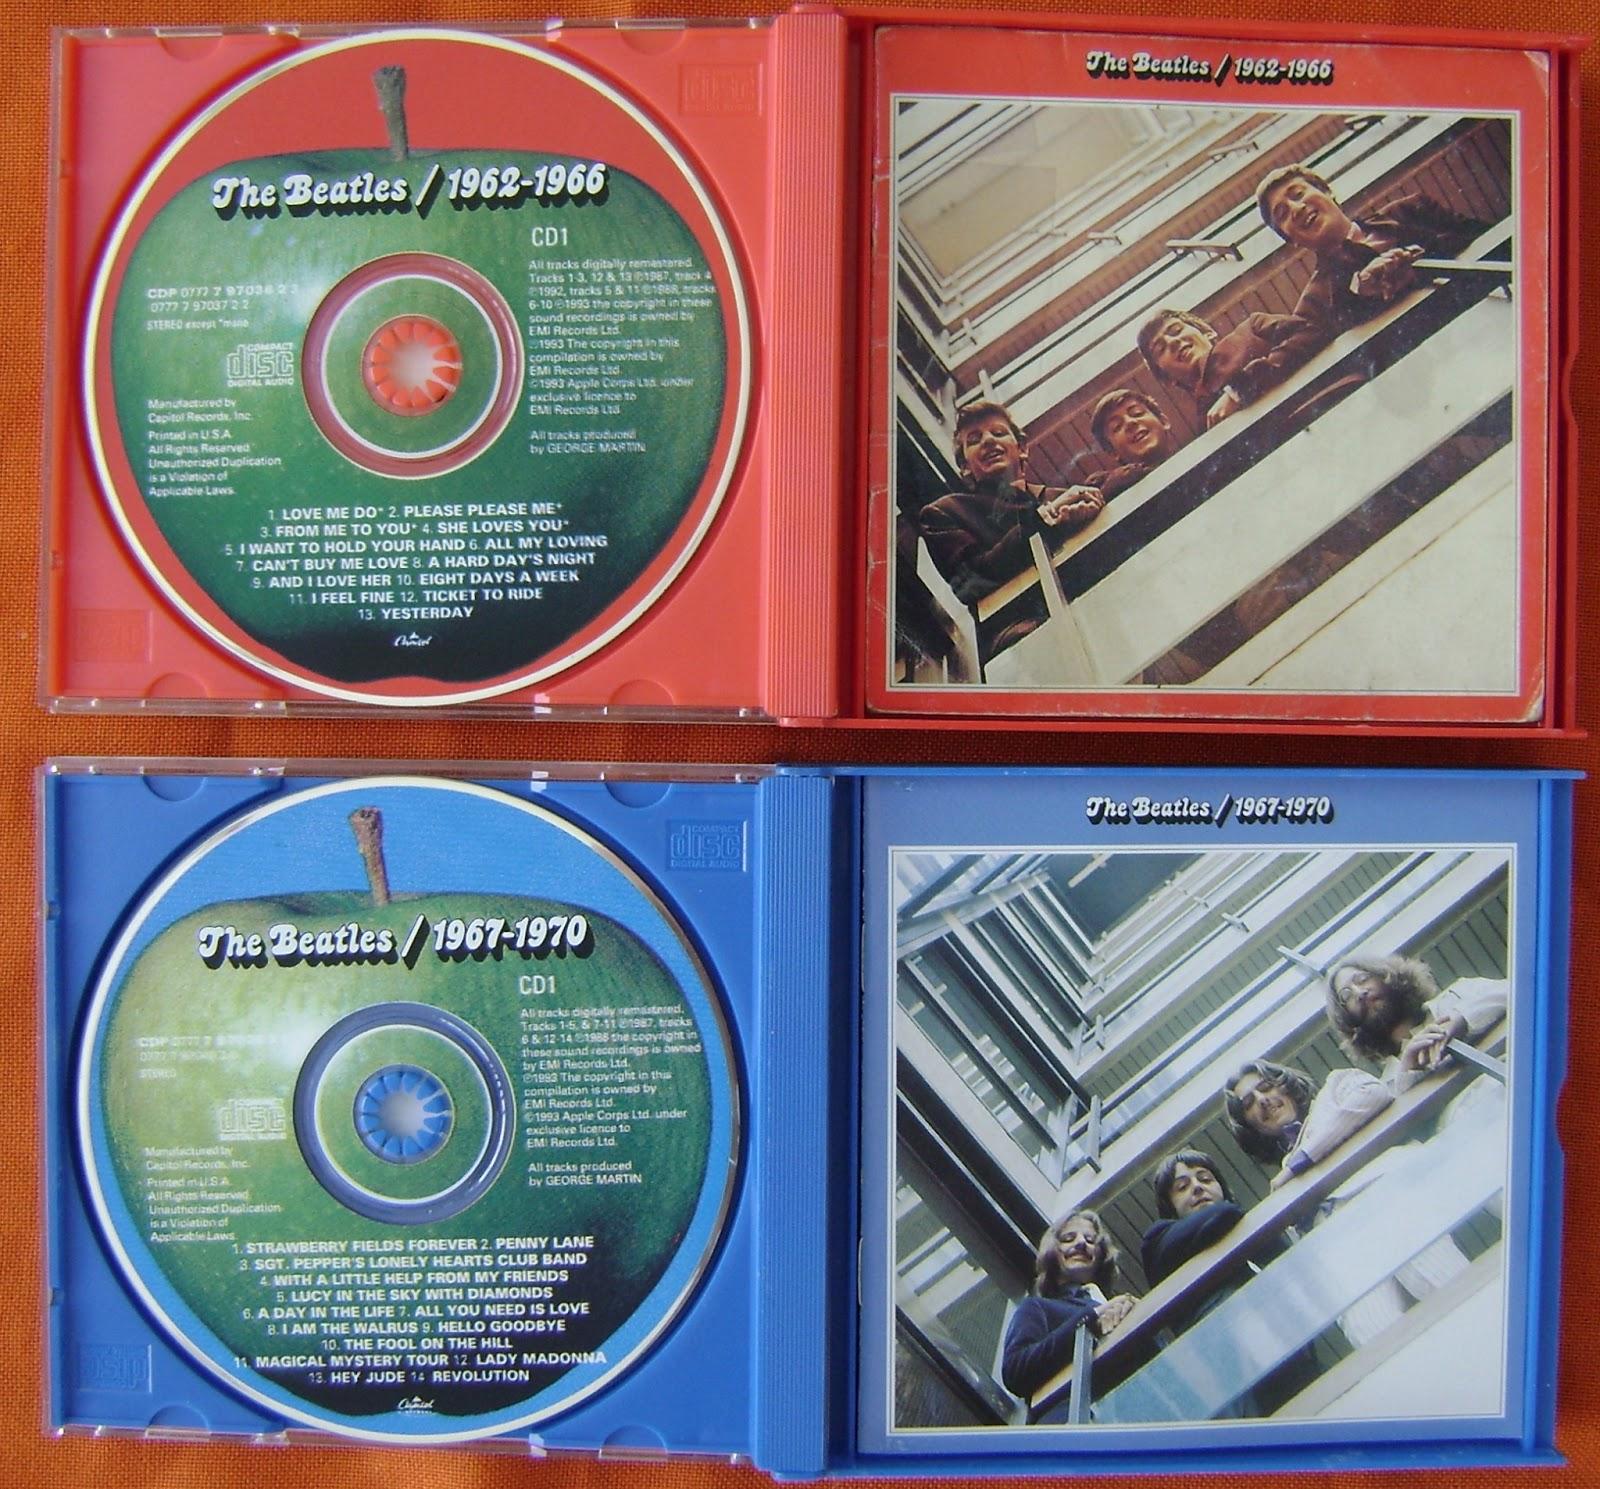 Beatles Album 1 1 The Beatles / 1962-1966 Red